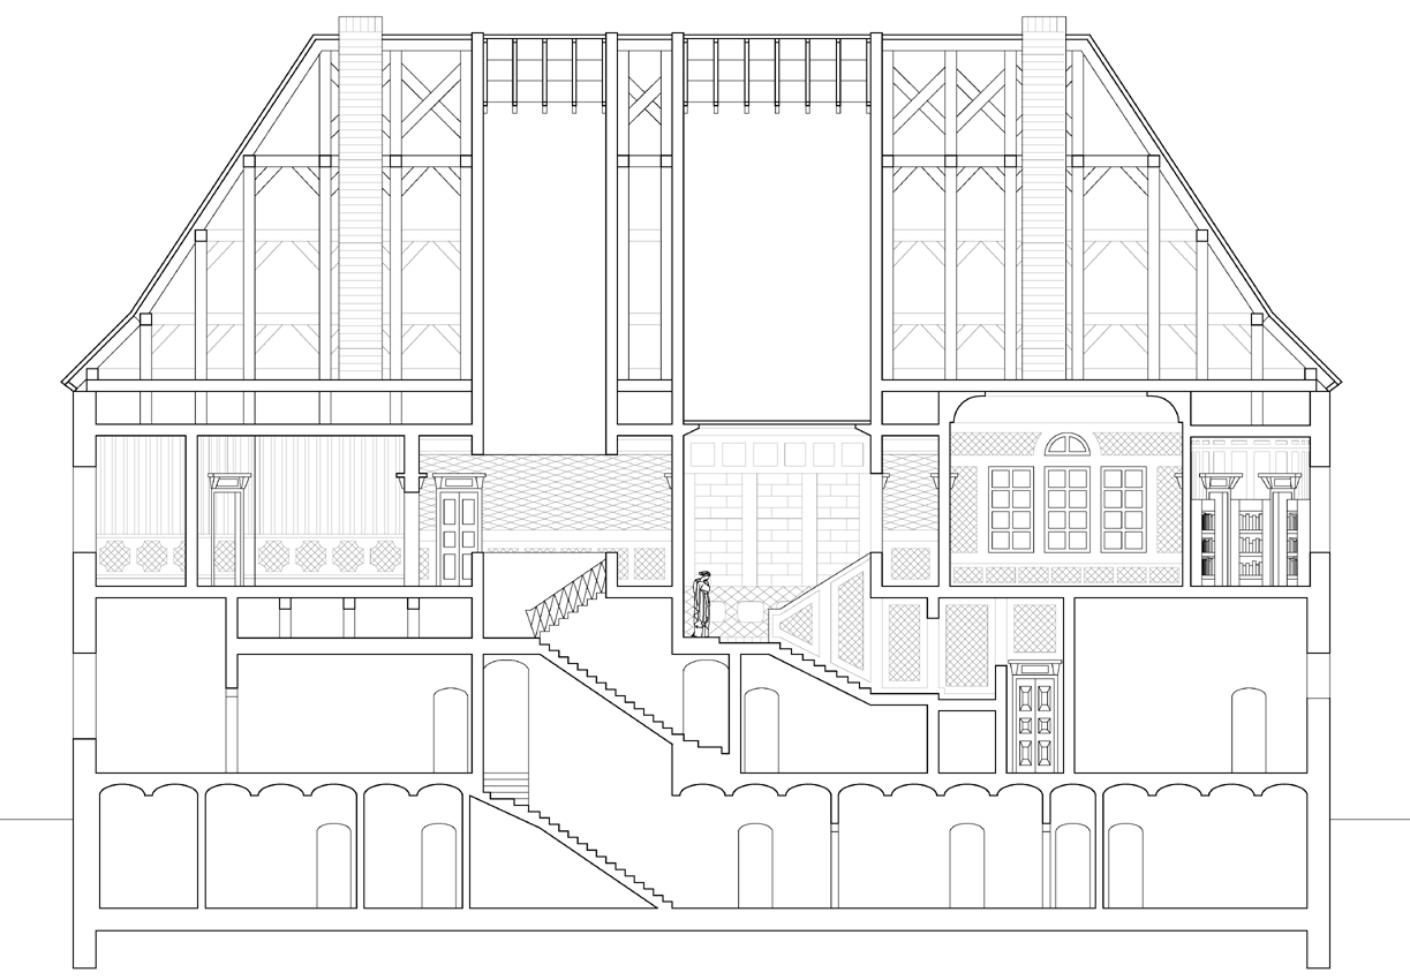 Rekonstruktion Rosenhaus, Adalbert Stifter, Nachsommer, Uwe Bresan